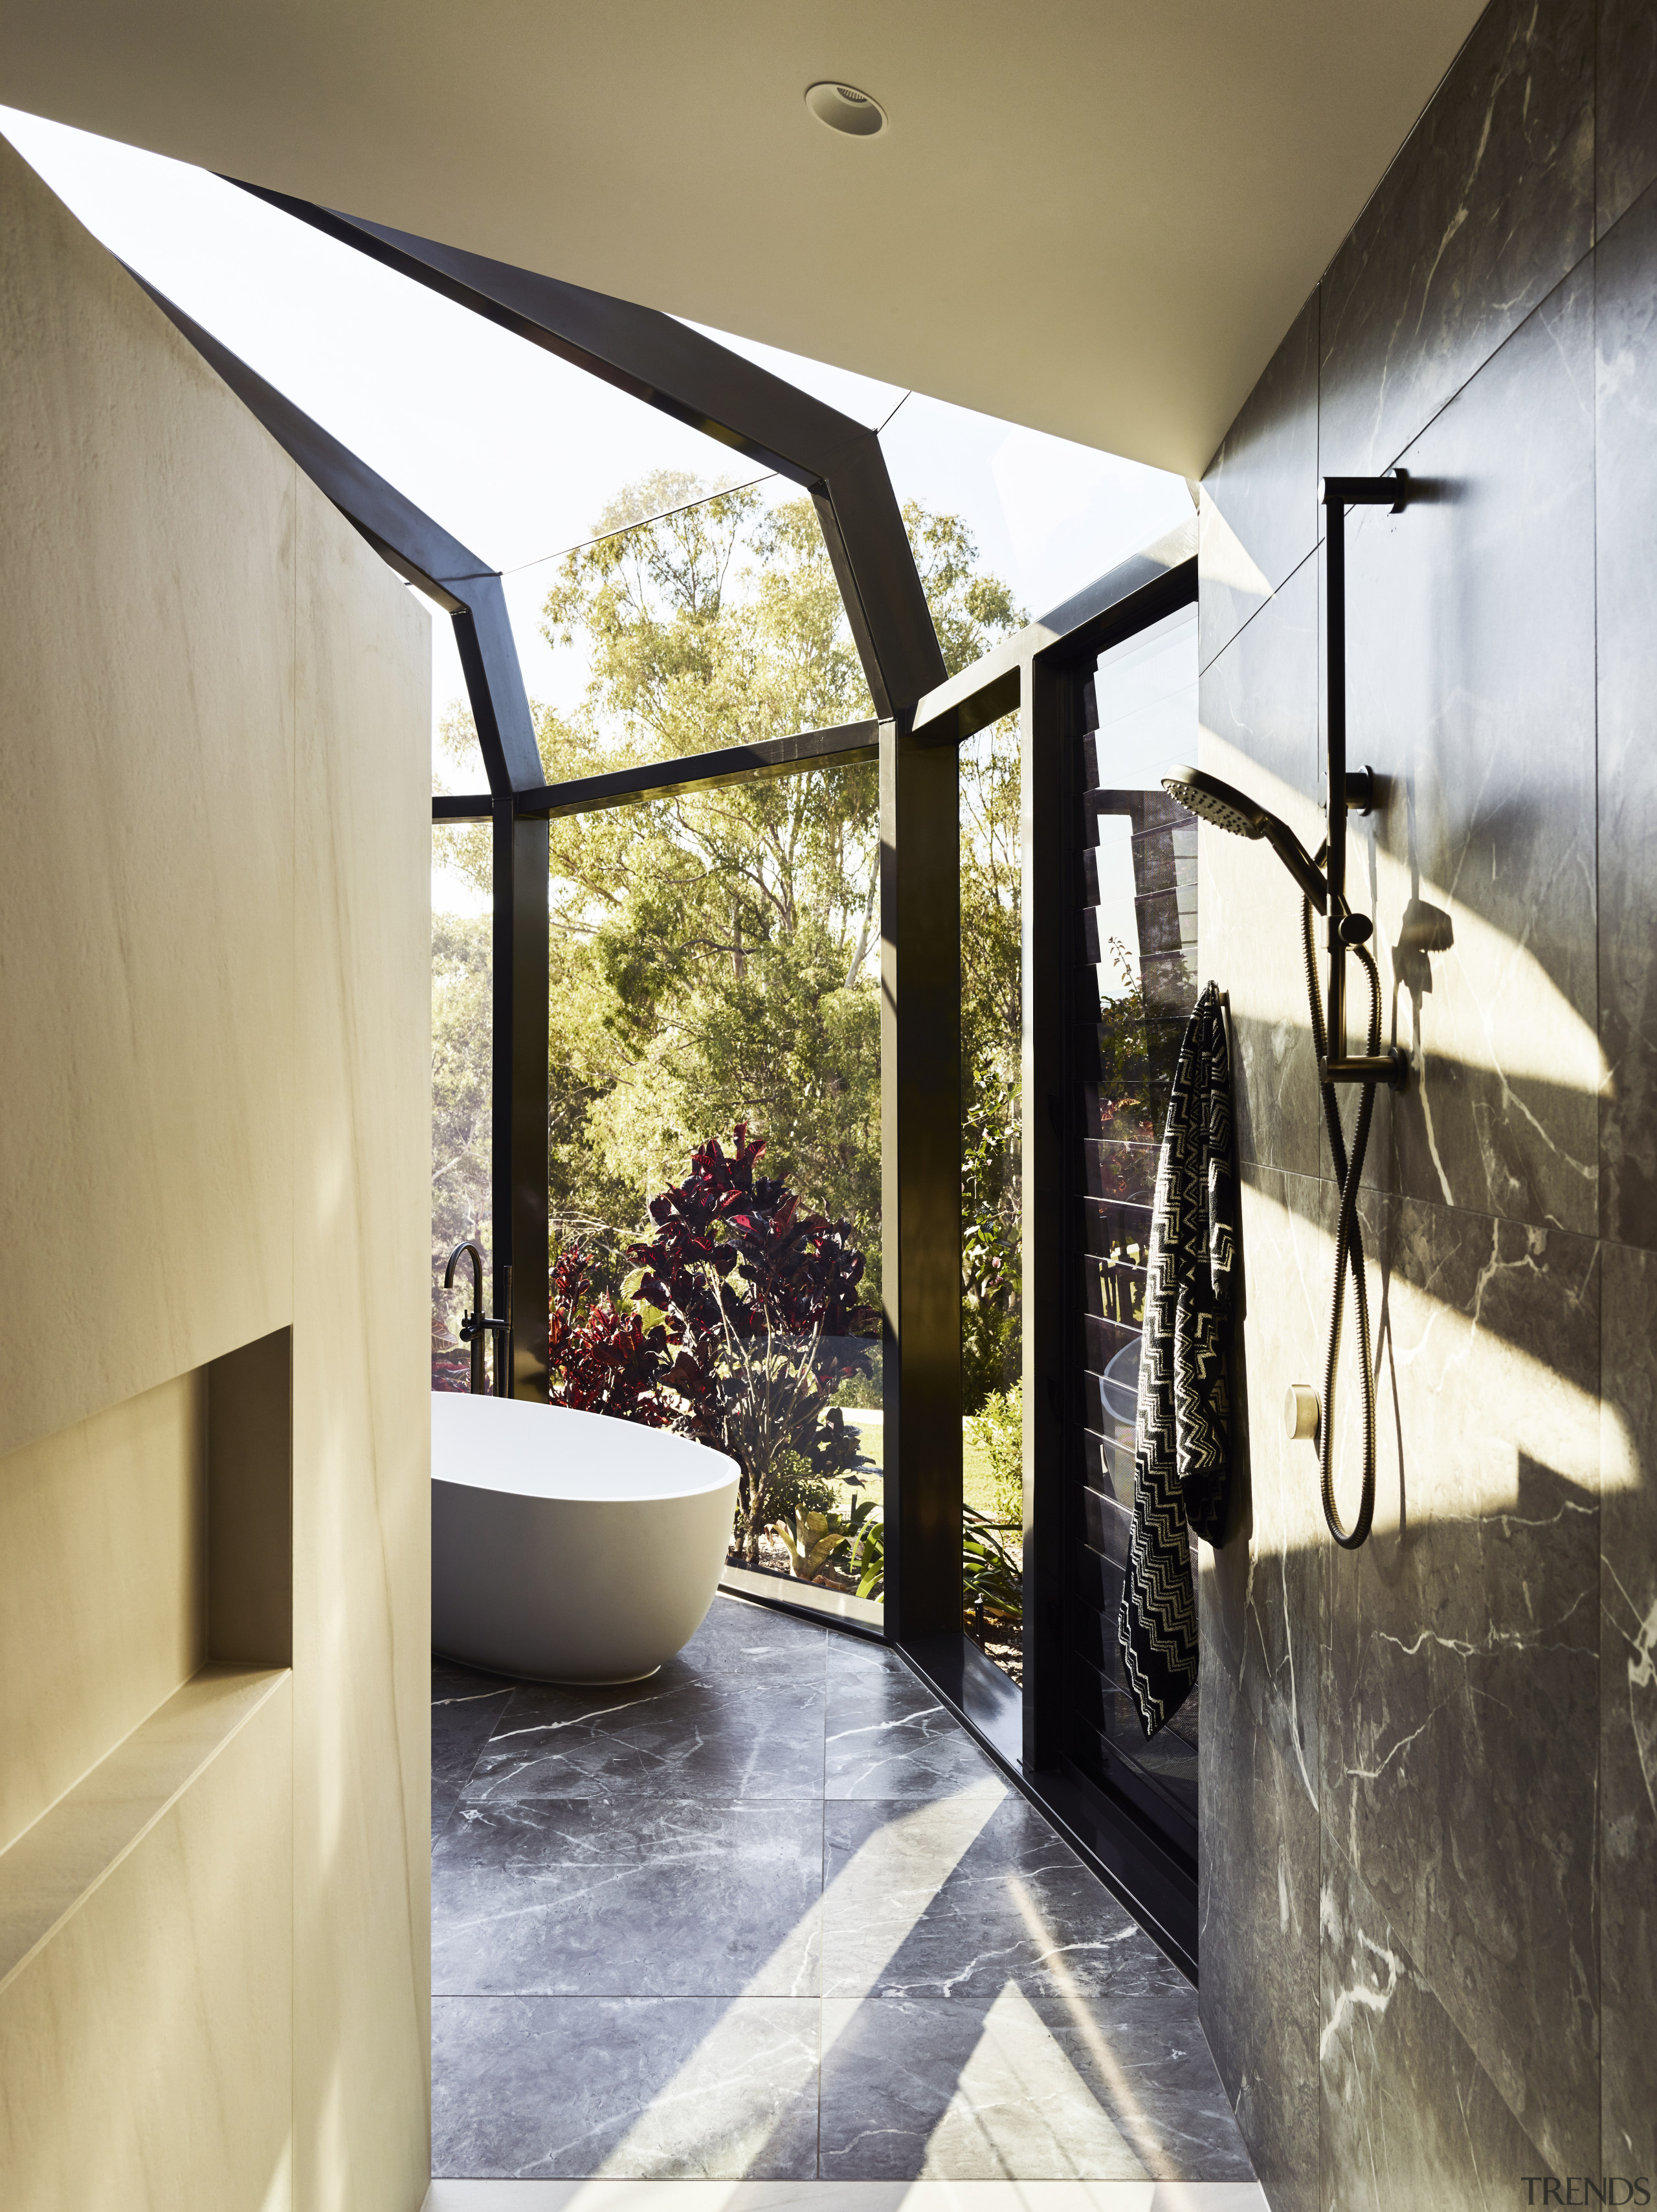 For this bathroom design, the depth of the architecture, bathroom, floor, flooring, home, house, interior design, ceramic tile, Darren James, shower zone